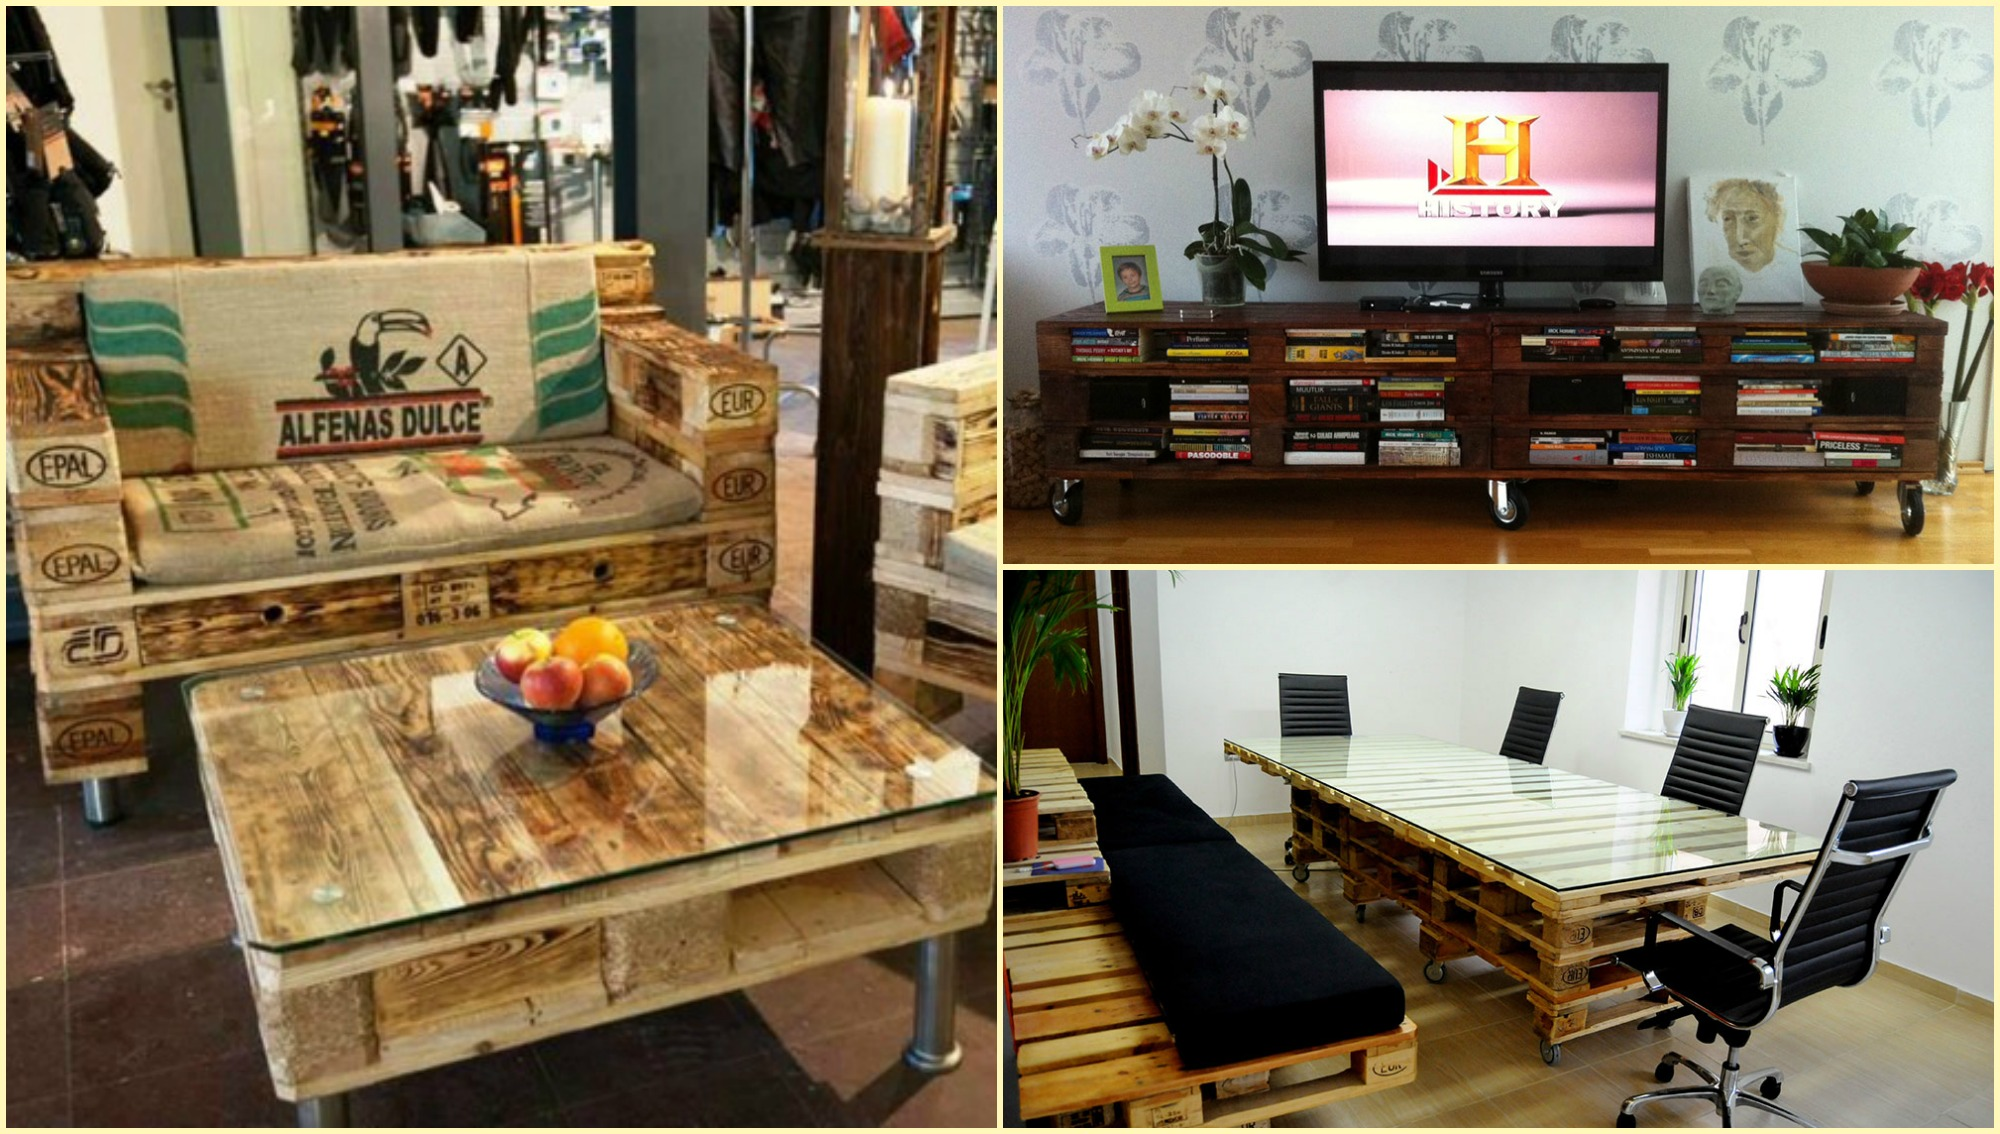 para convertir PALLETS en increíbles muebles – manos a la obra